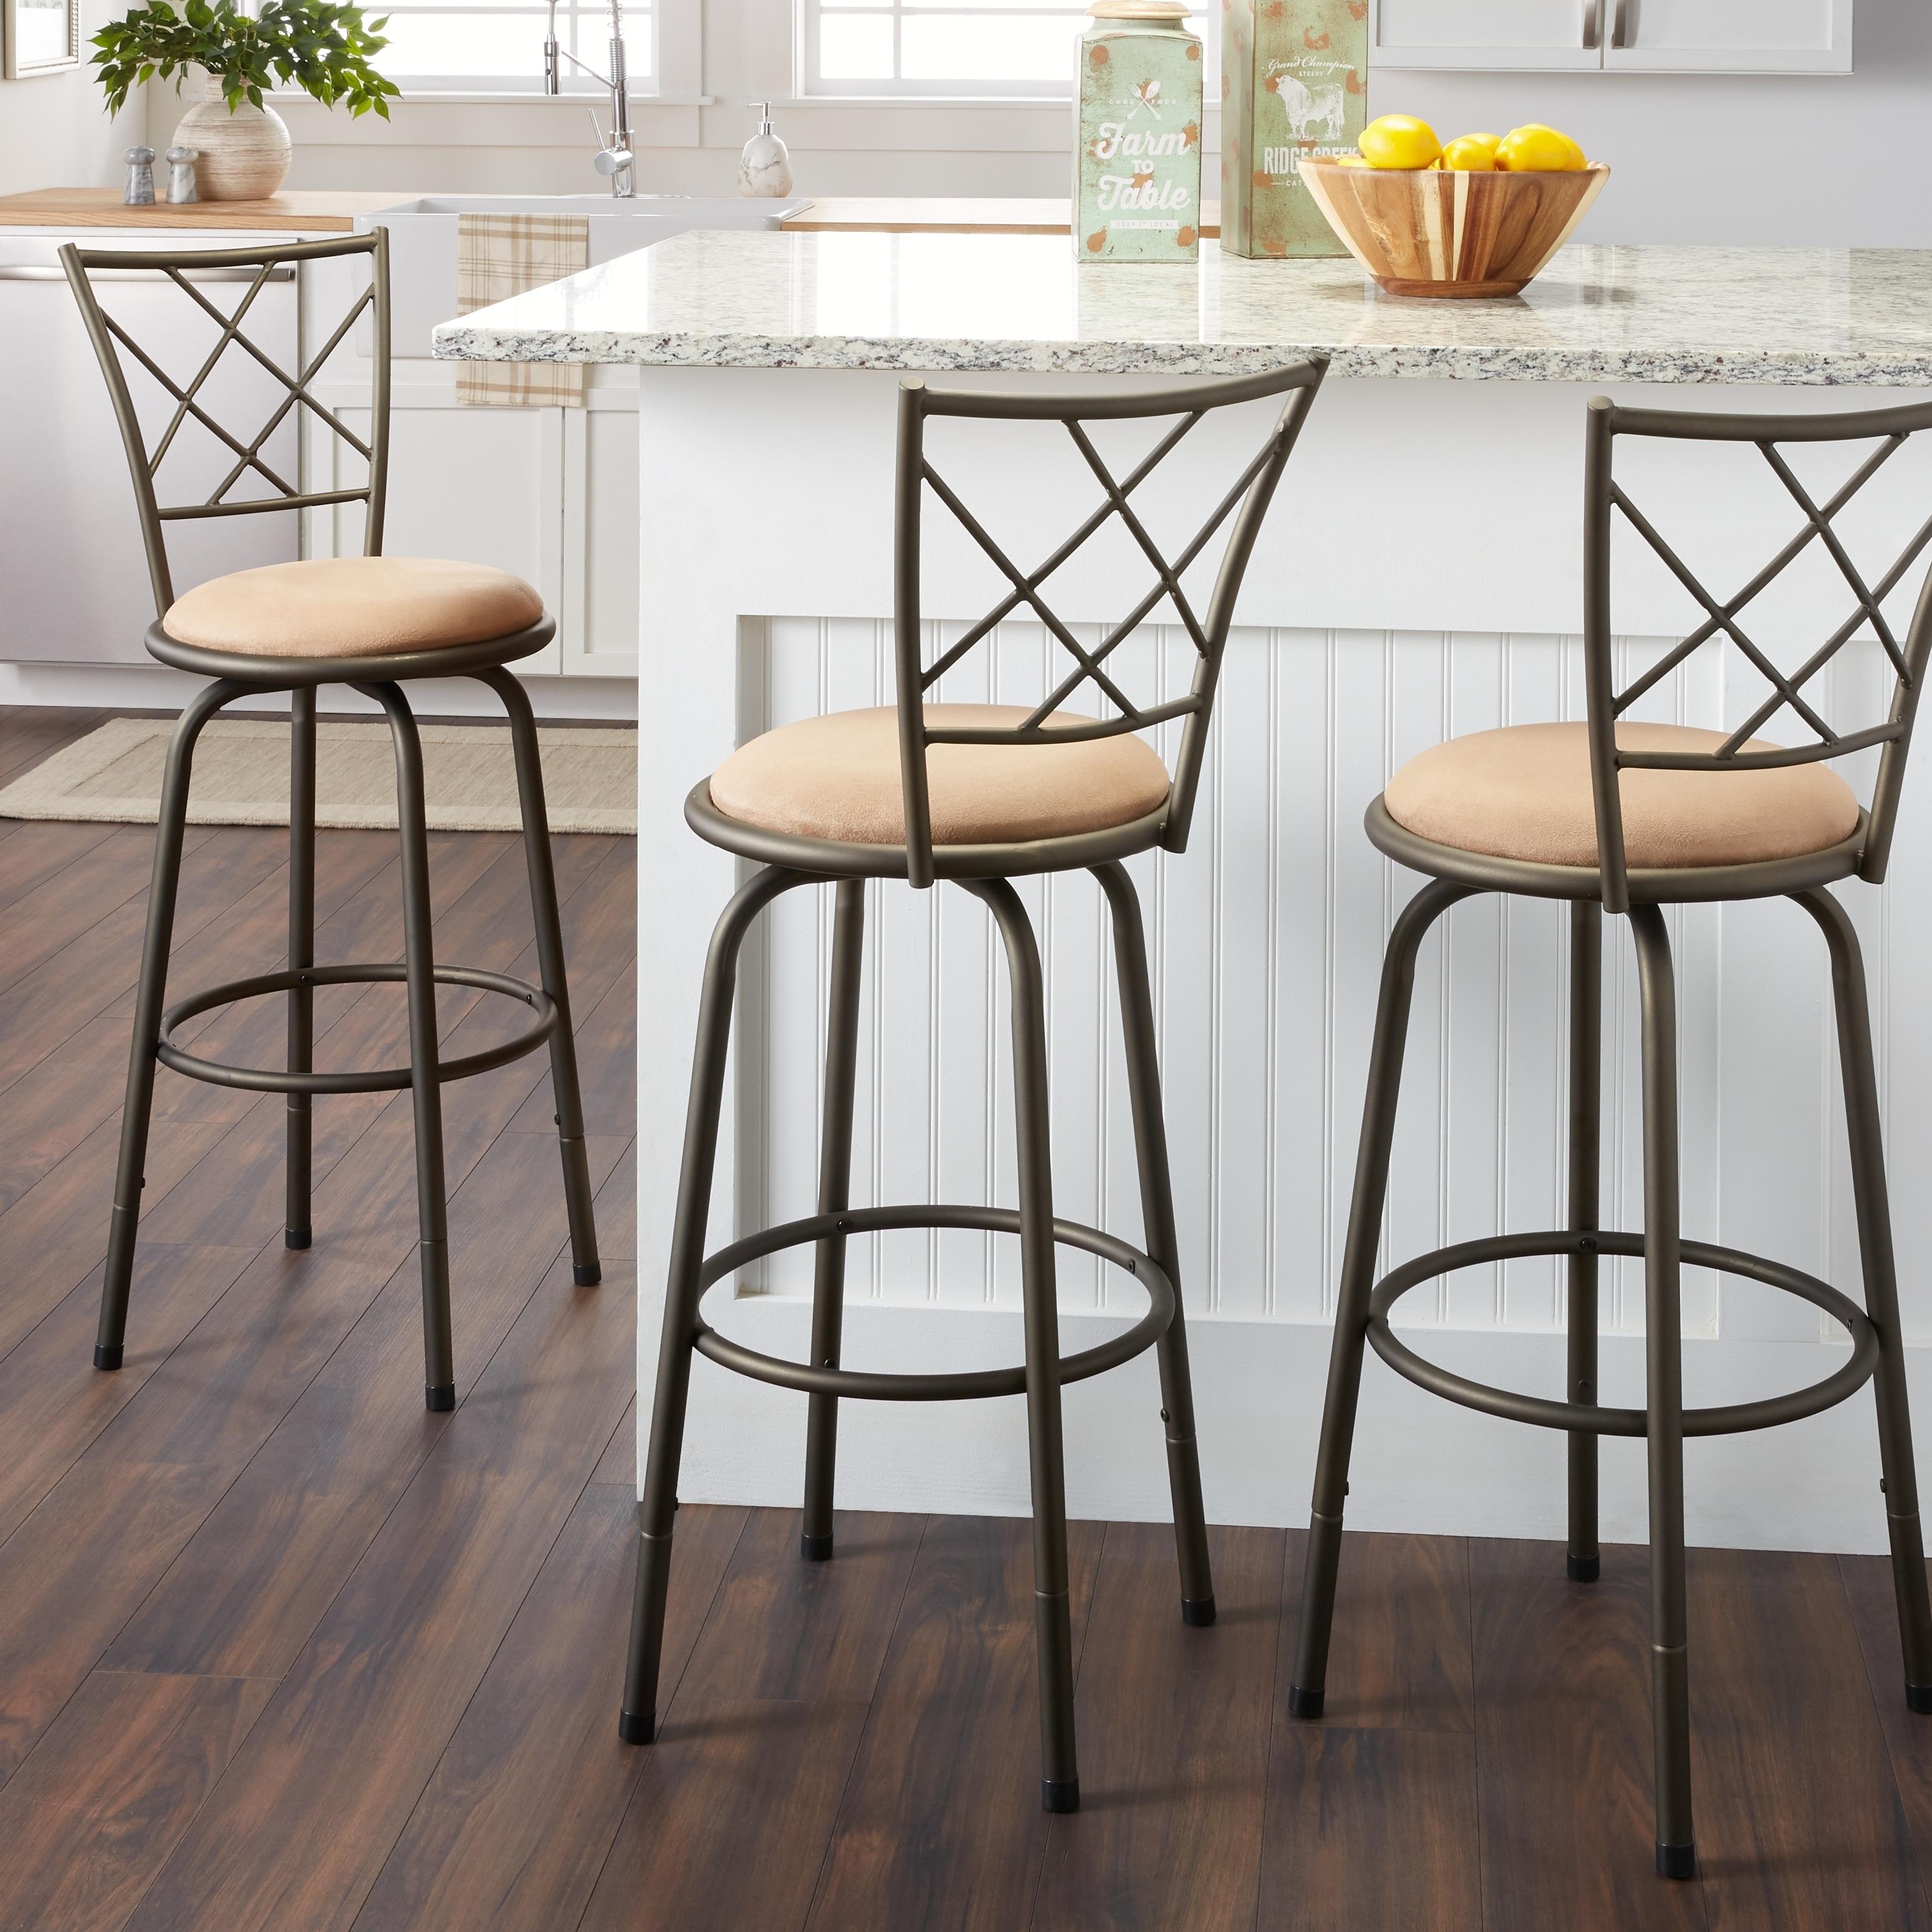 Astonishing Avalon Quarter Cross Adjustable Swivel High Back Kitchen Stools Set Of 3 By Inspire Q Classic Machost Co Dining Chair Design Ideas Machostcouk